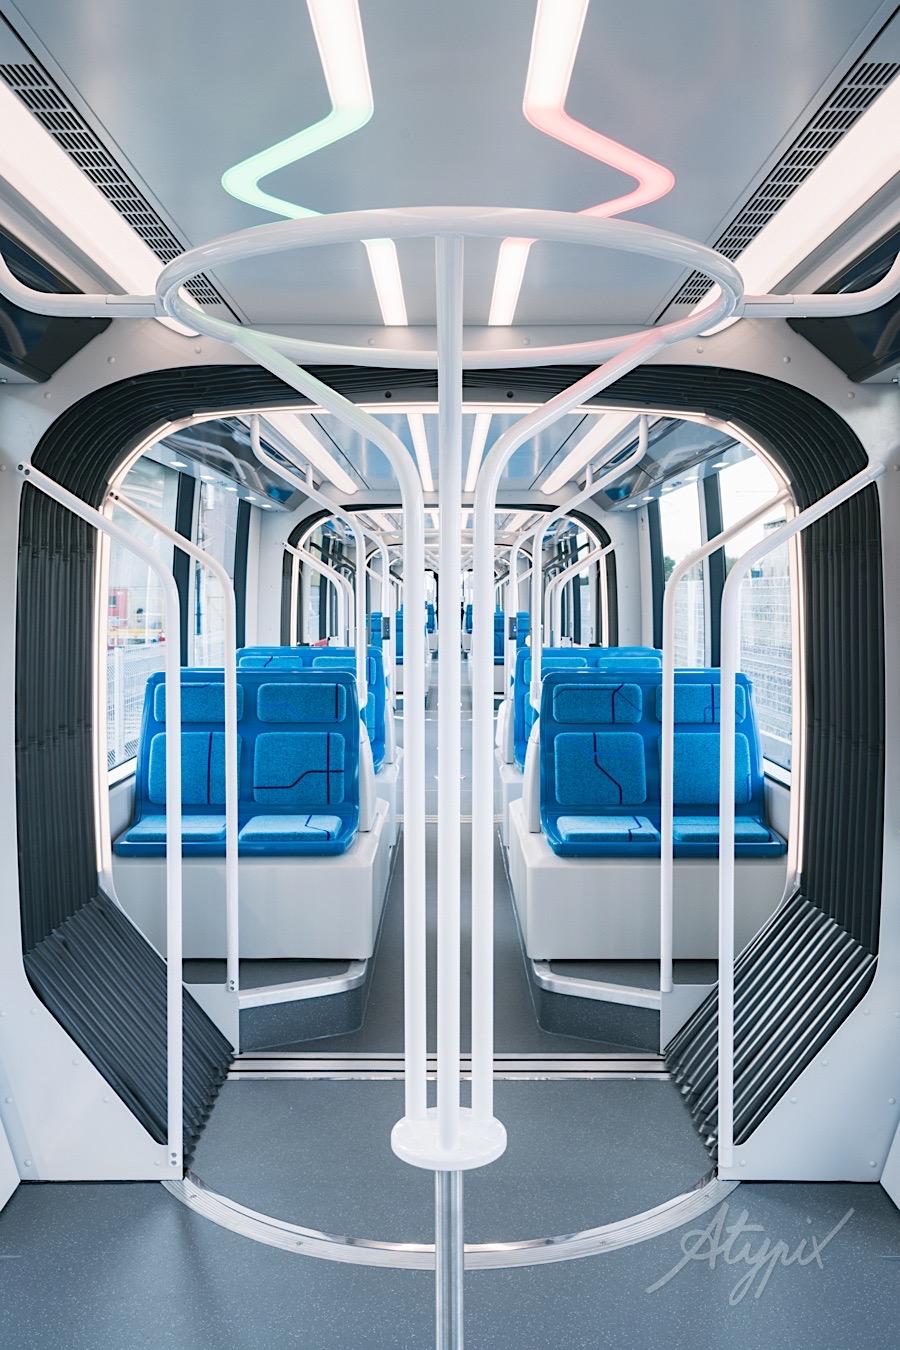 Reportage industriel tramway t9 alstom